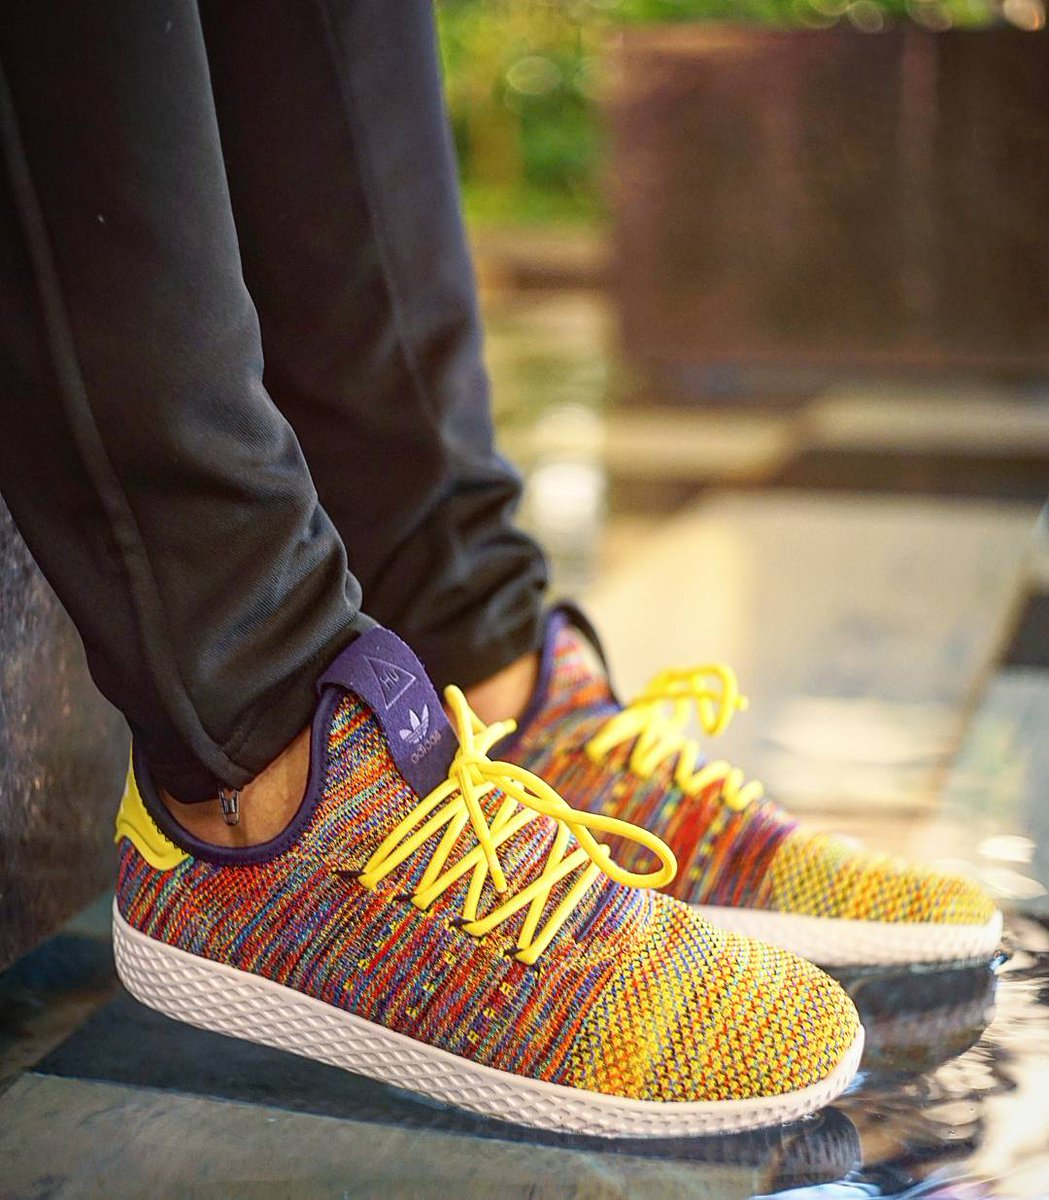 quite nice 94bbc 5b655 Pharrell x Adidas Originals Tennis HU Multi-Color! Review soon 🌈  🔥🔥🔥🔥🔥🔥🔥 adidas pharrell pharrellwilliams… httpst.coQuDWUoT6kl